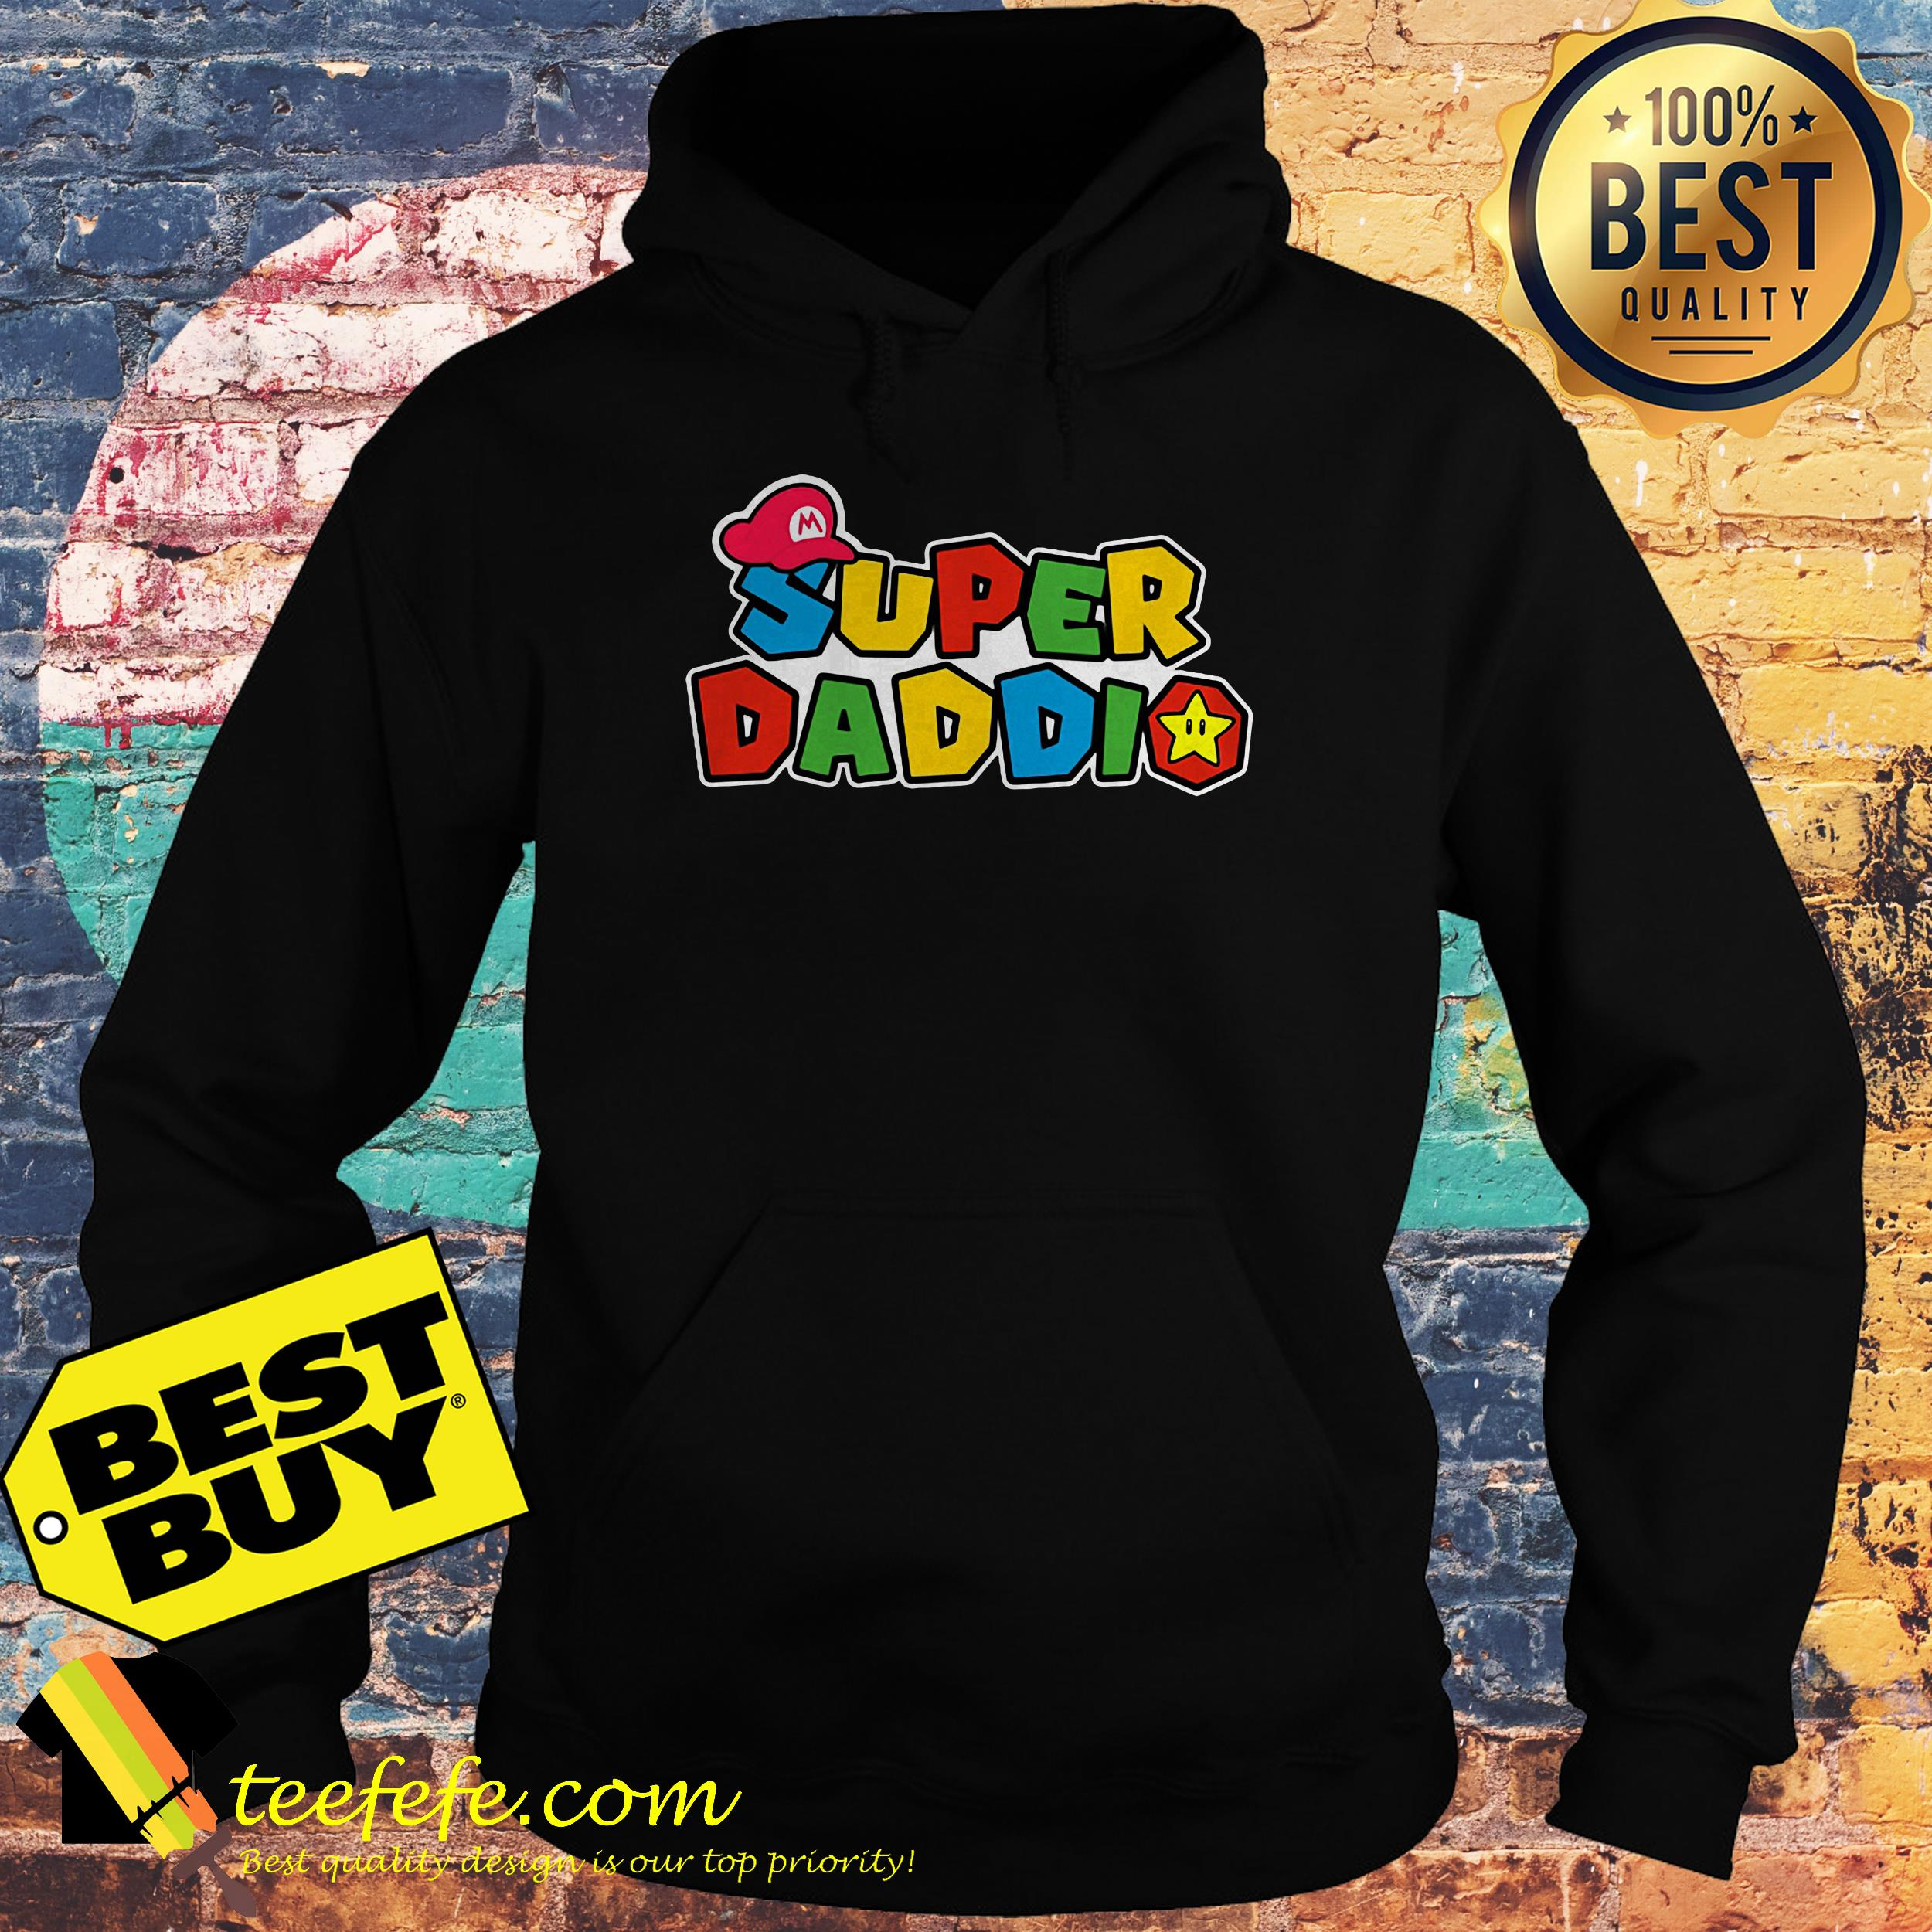 Super Daddio Super Mario hoodie